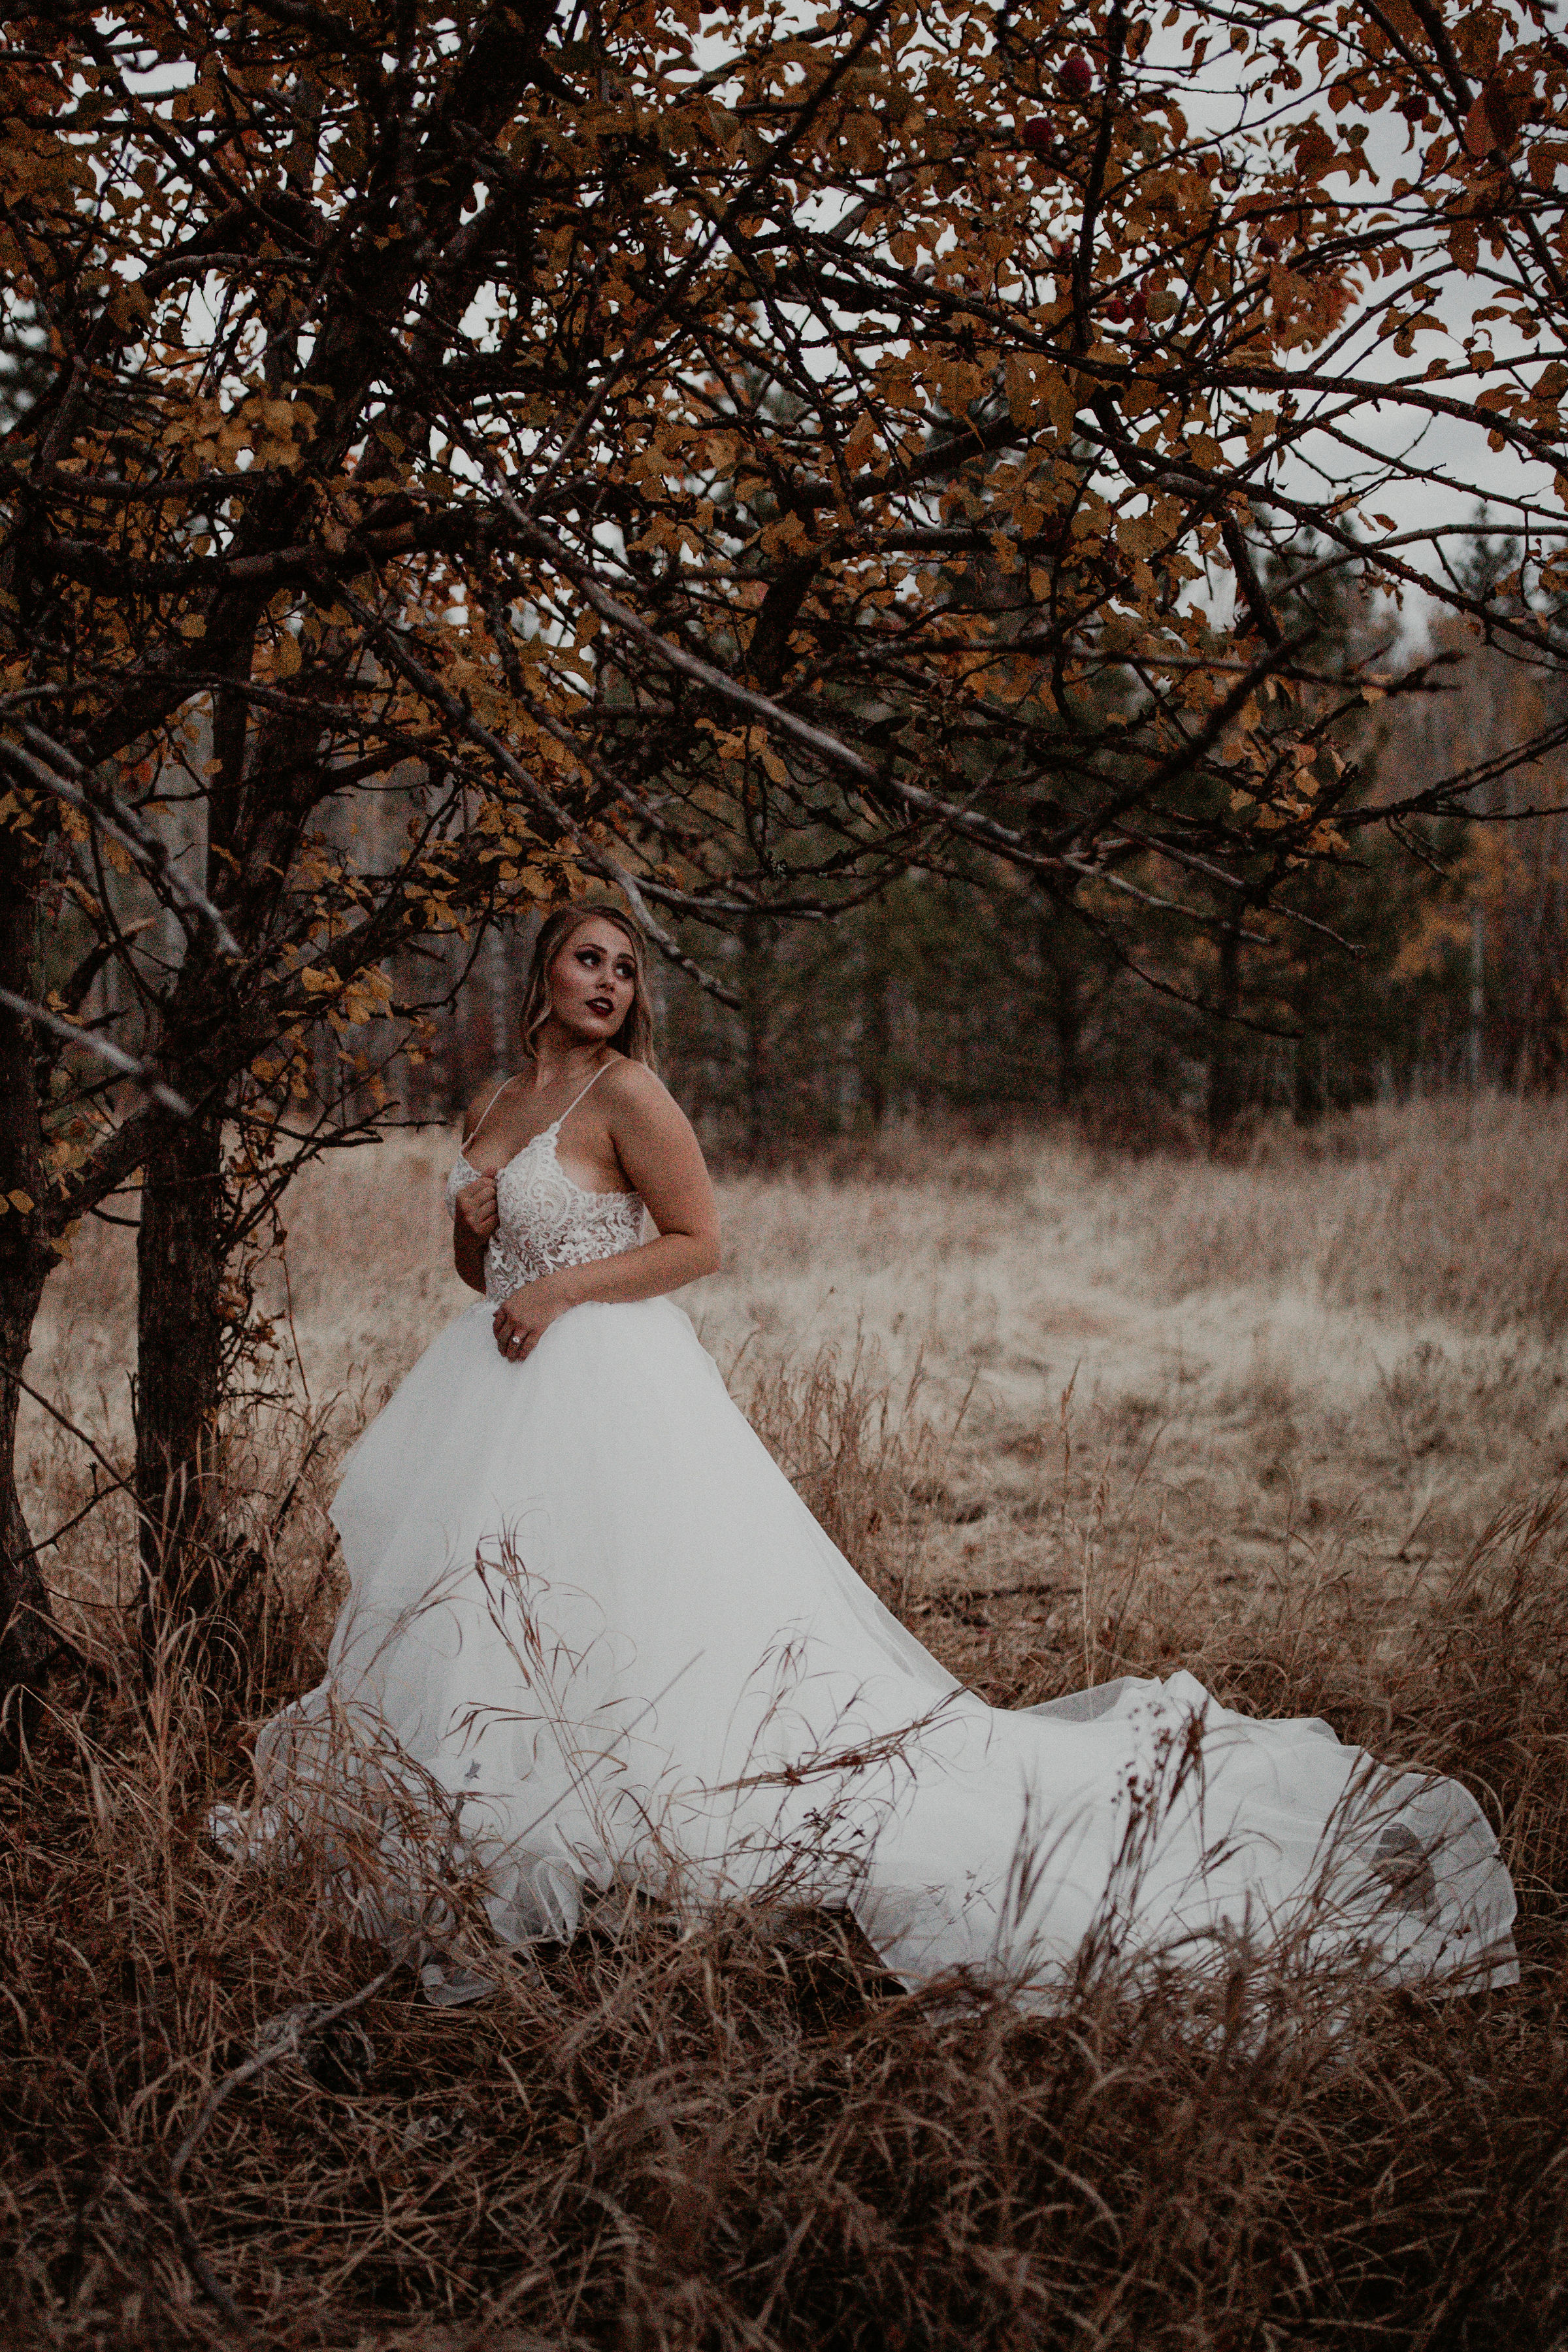 bridal gown under tree spokane image